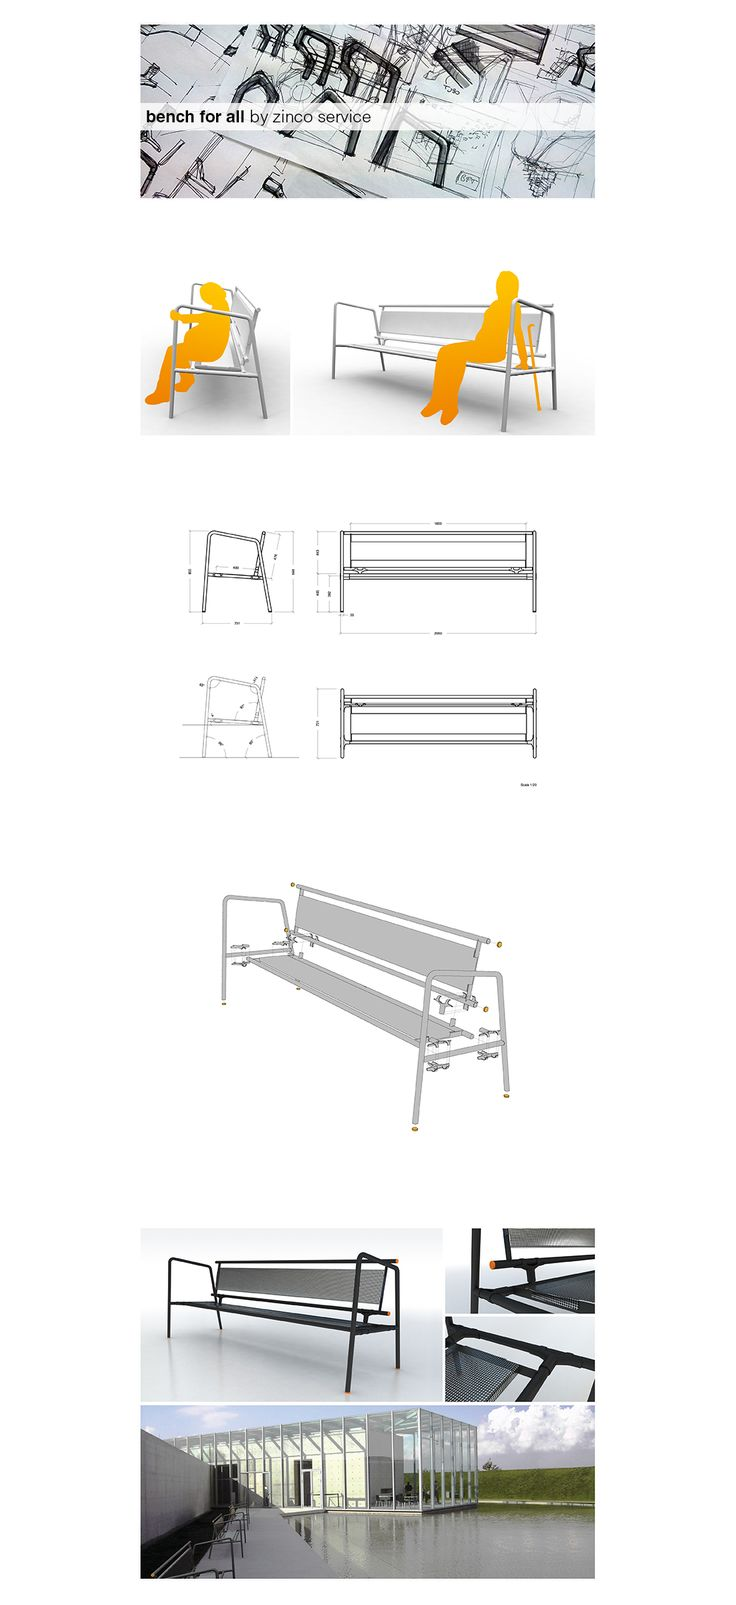 Panchina design by Zinco Service